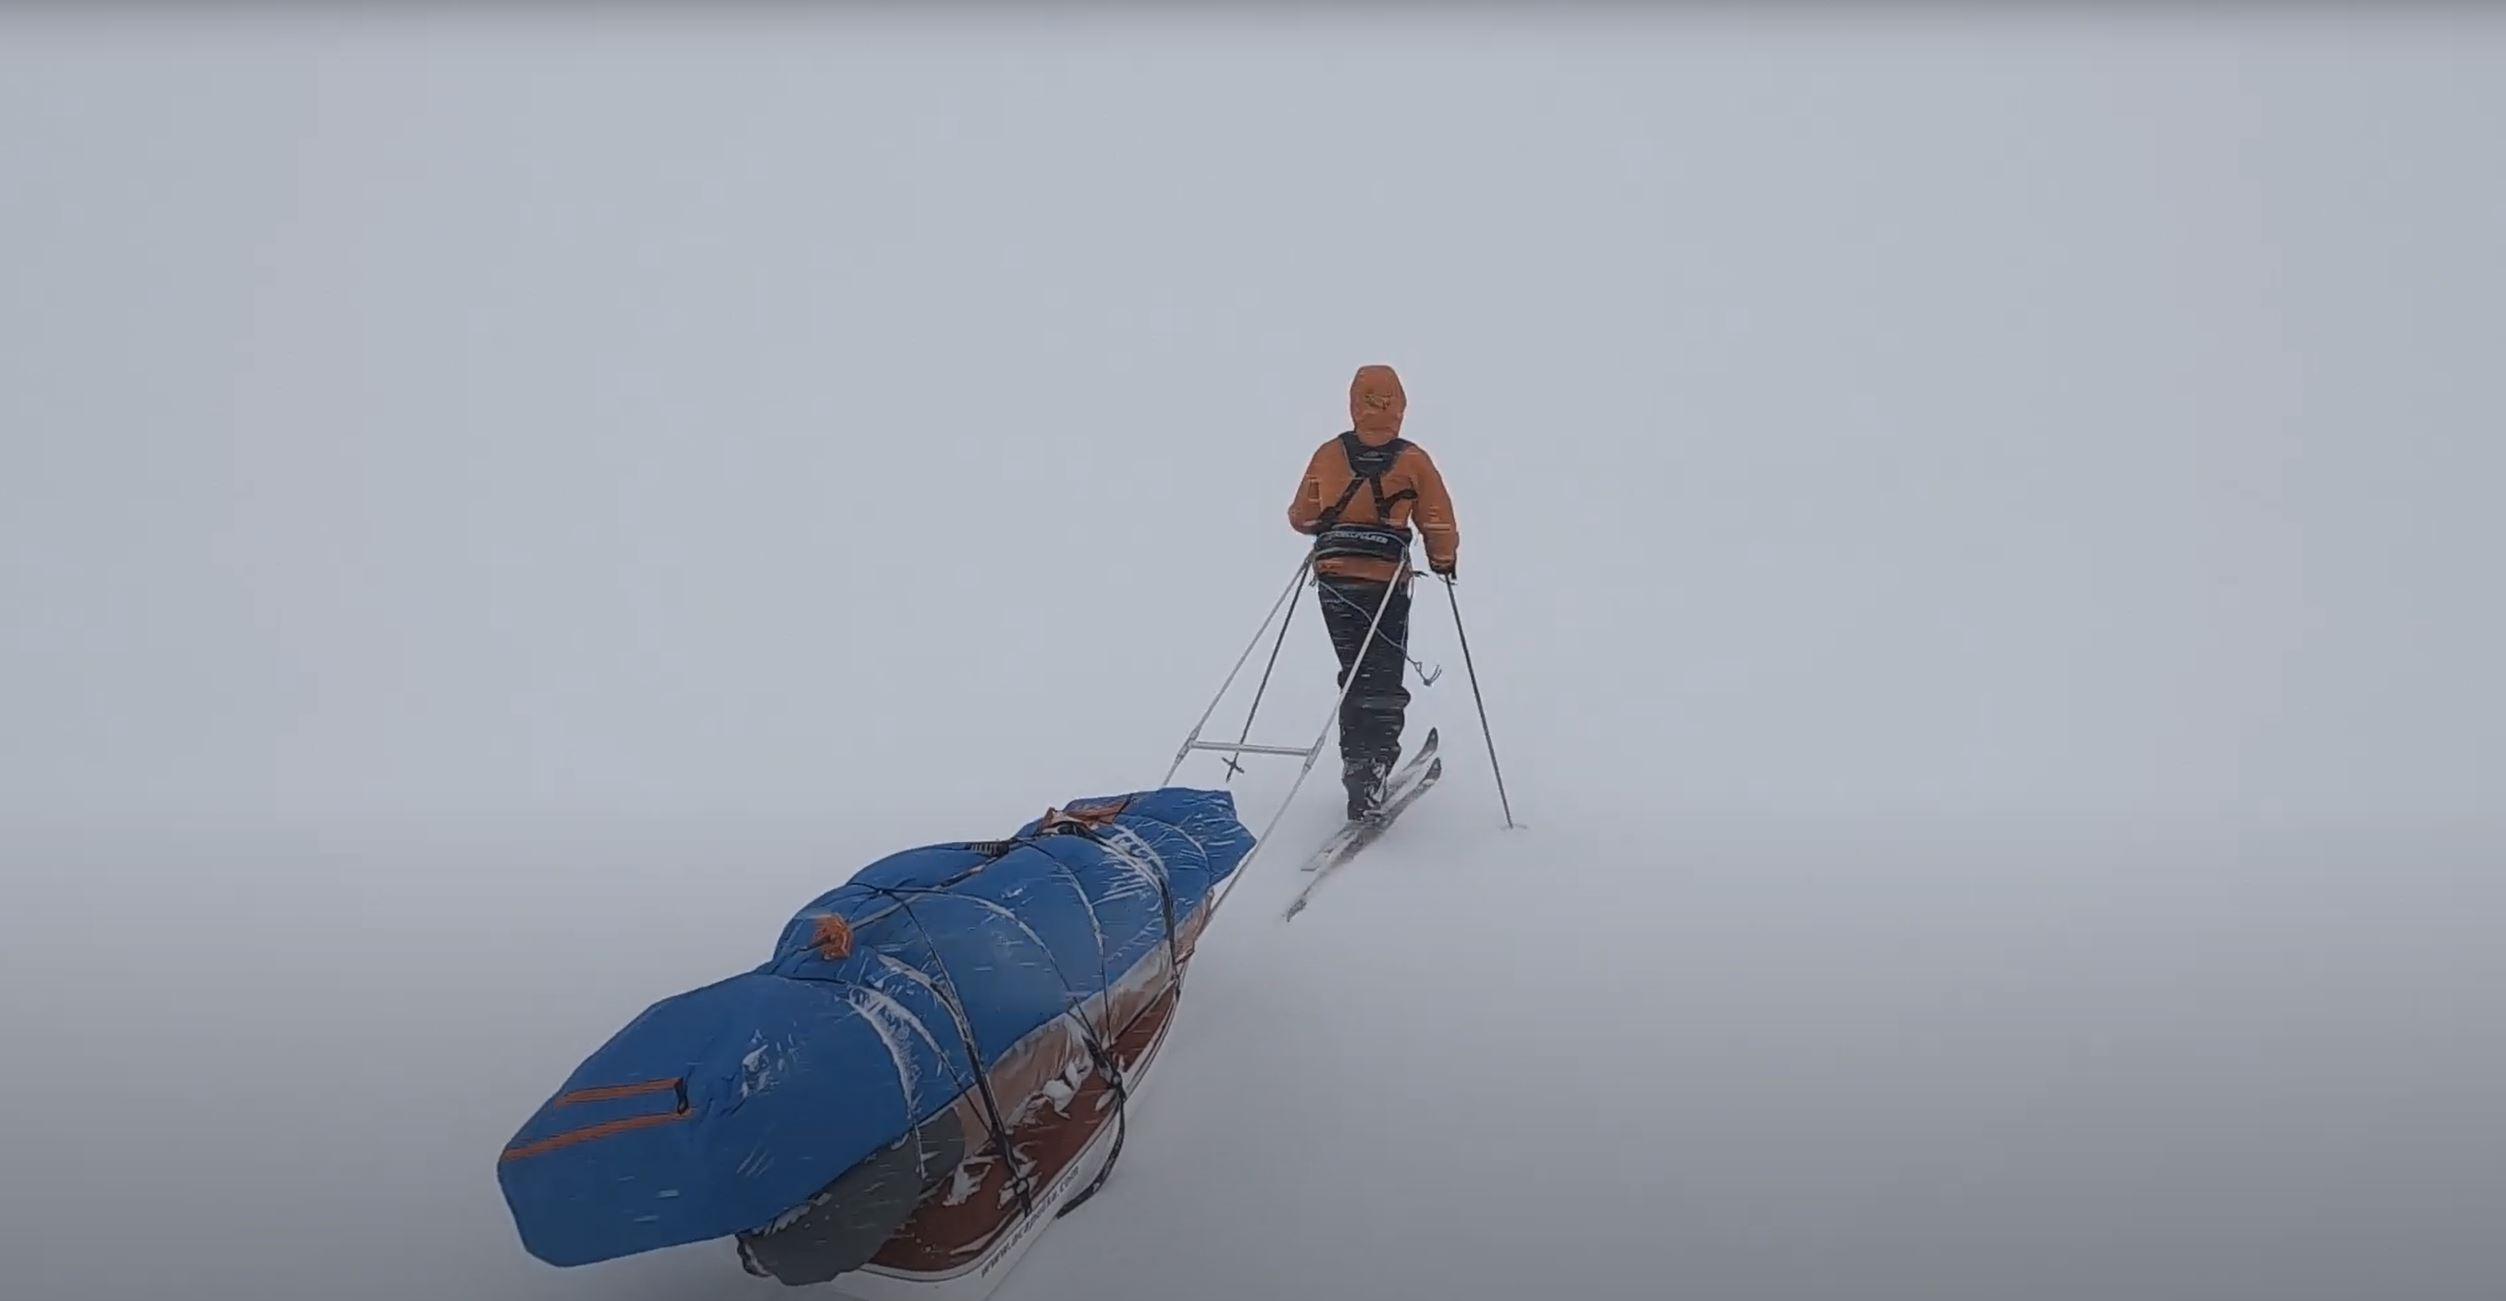 Vintertur på Hardangervidda